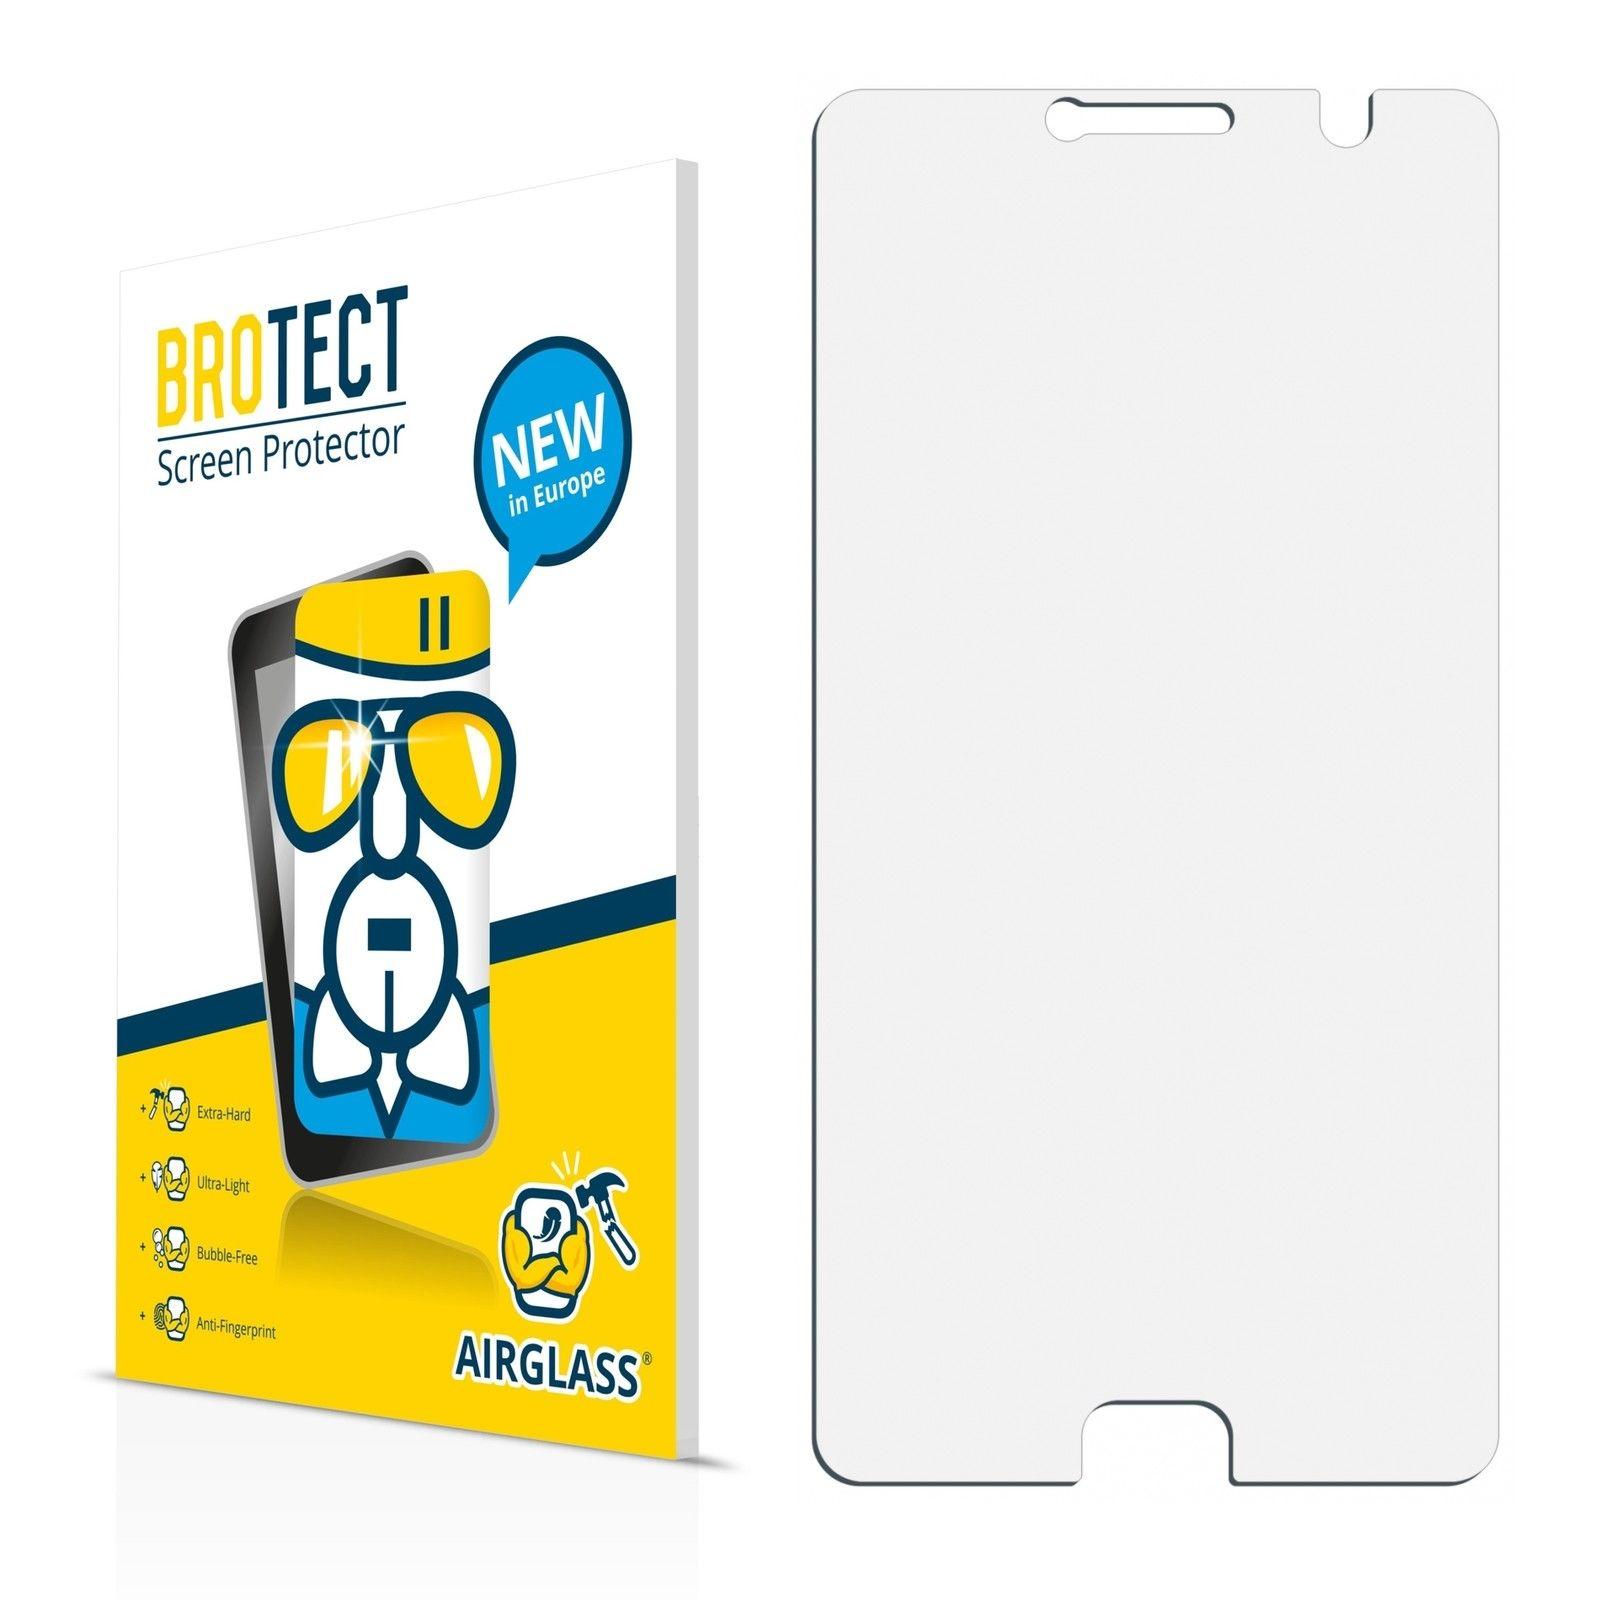 Extra tvrzená ochranná fólie (tvrzené sklo) AirGlass Brotec na LCD pro Vodafone Smart Ultra 7